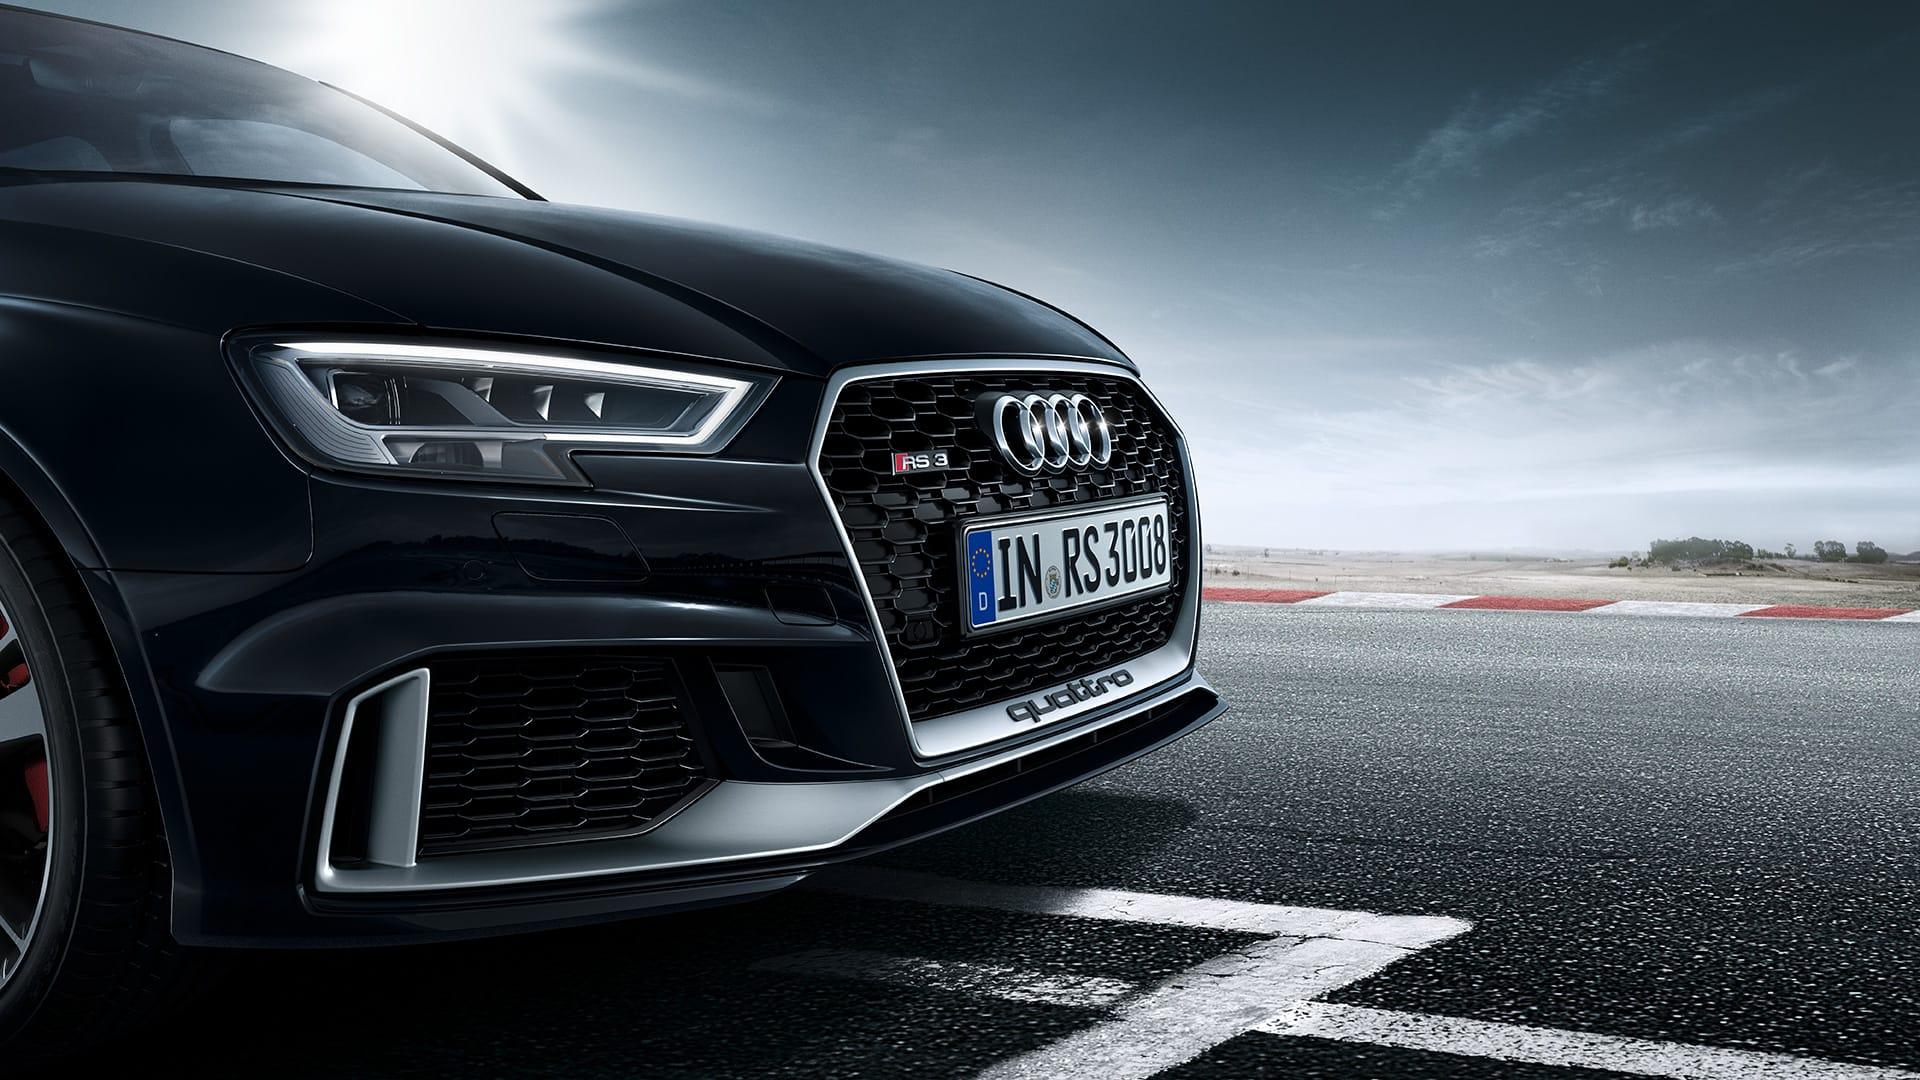 Rs 3 Limousine Gt A3 Gt Audi Deutschland